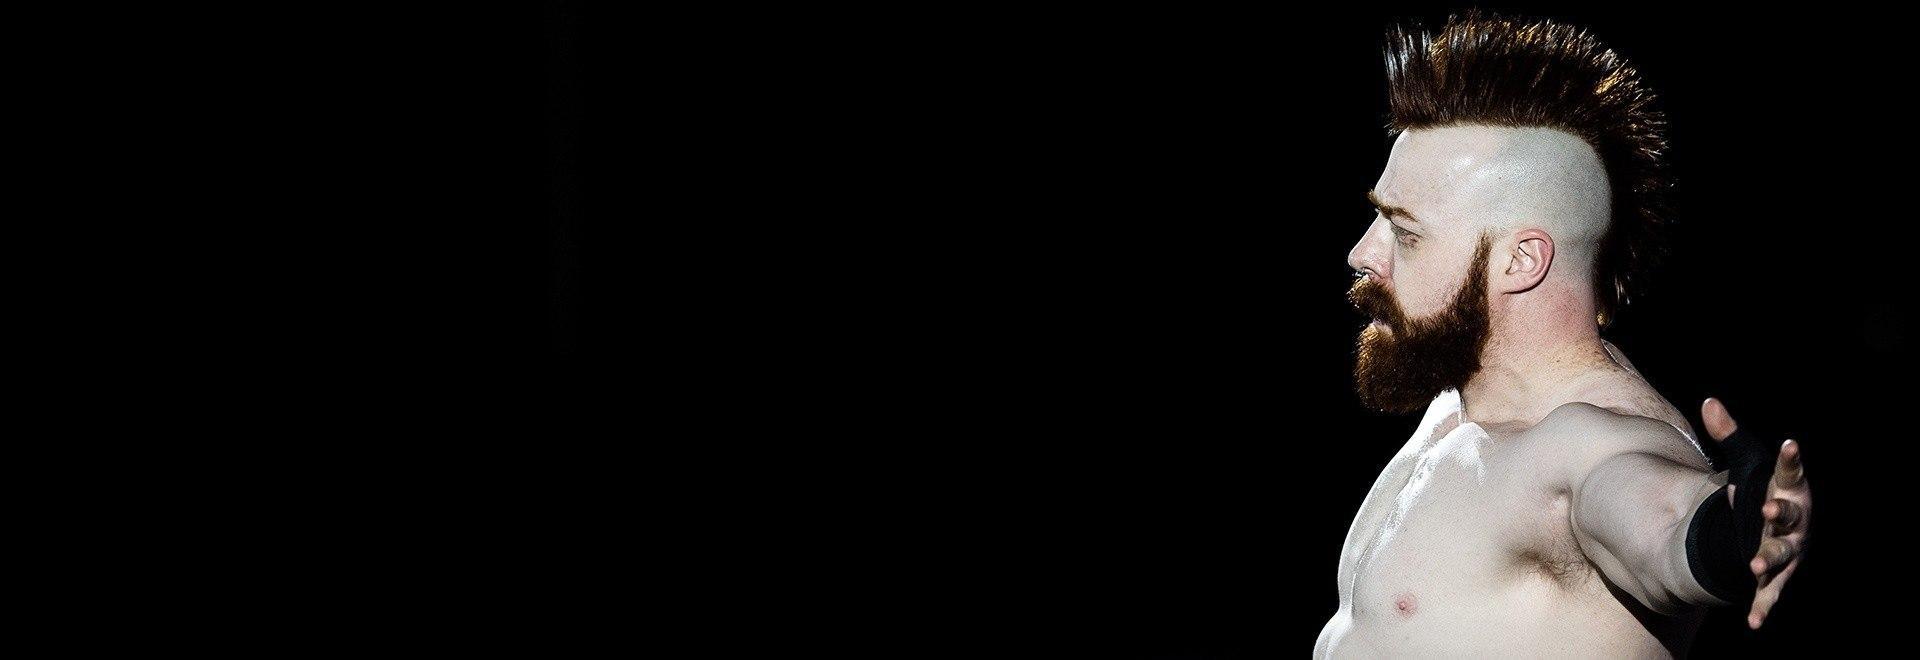 Ep. 255